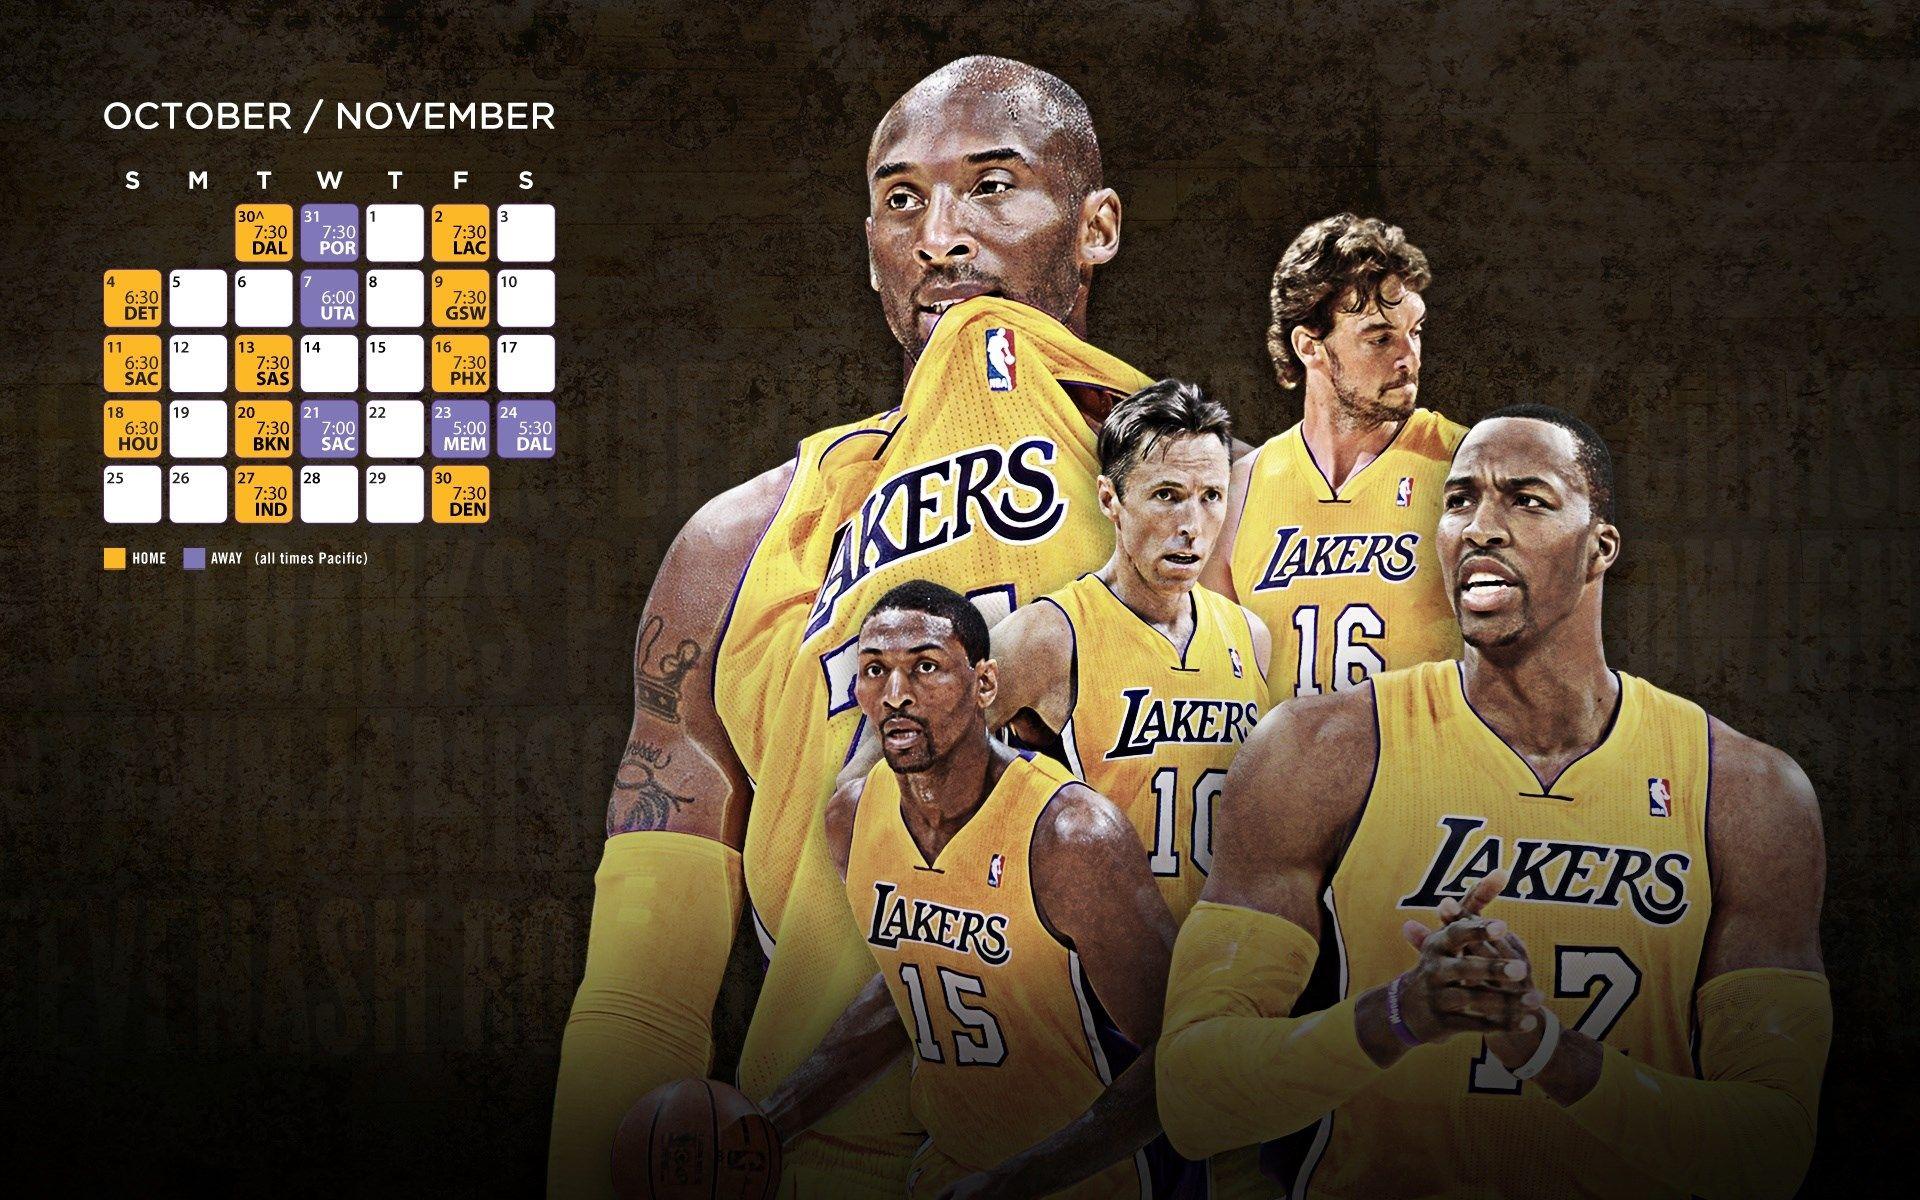 Nba La Lakers Roster Backgrounds La Lakers Lakers Roster Lakers Team